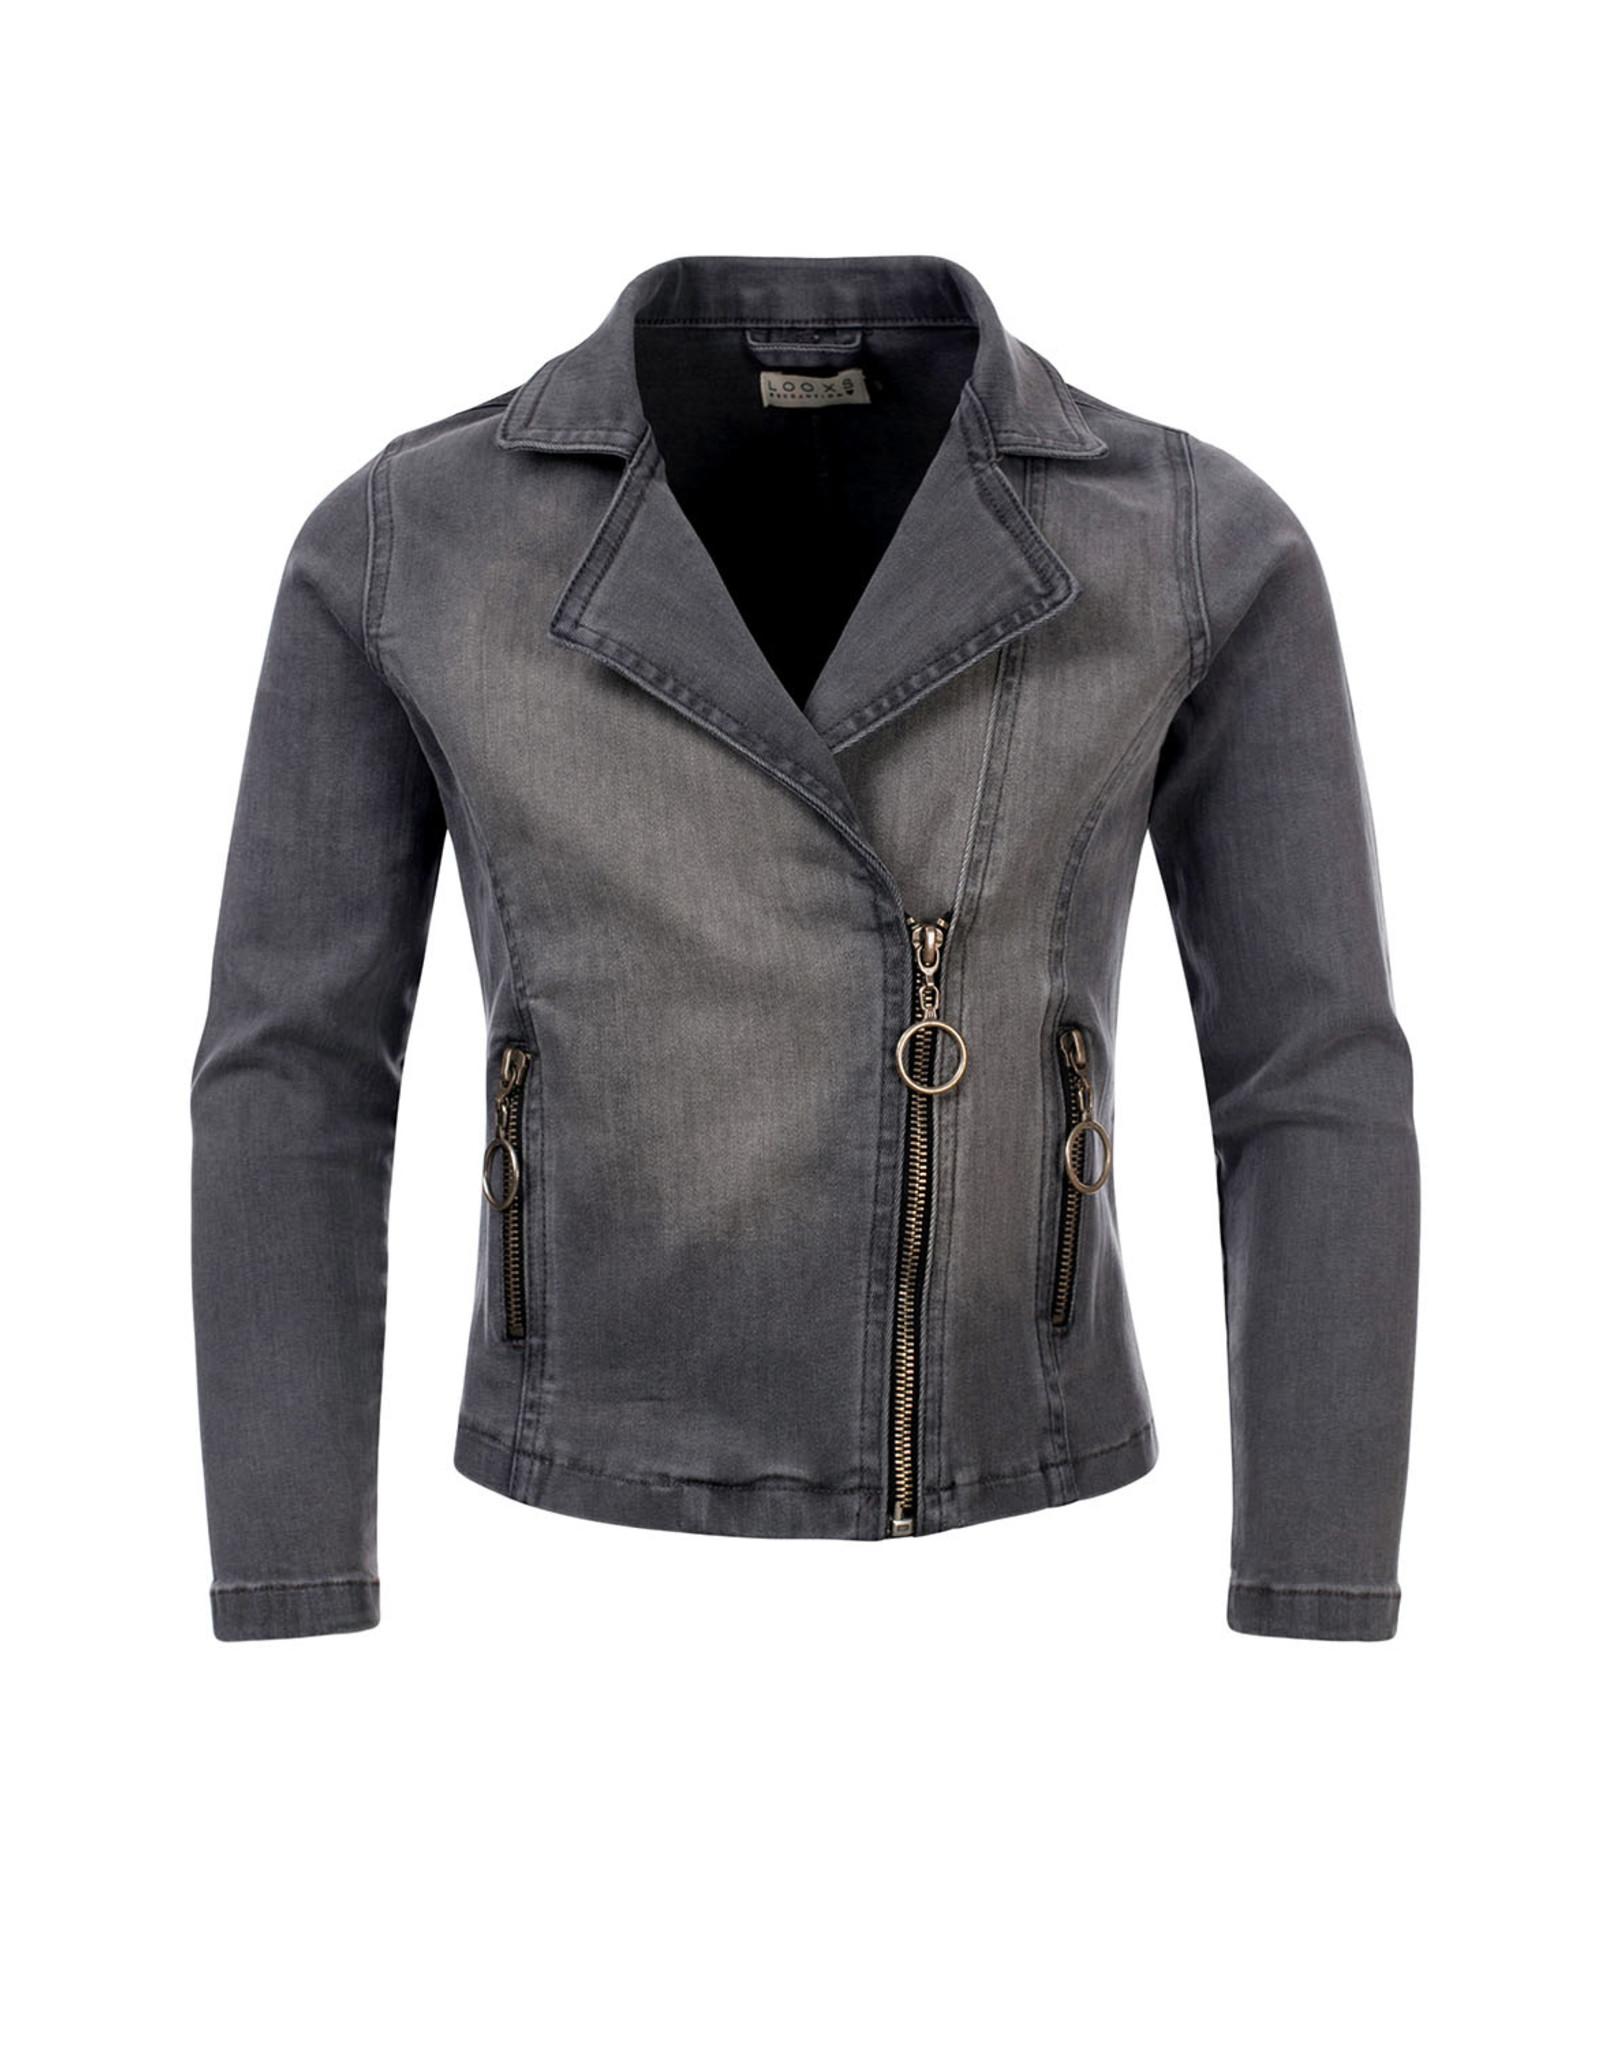 LOOXS 10sixteen biker jacket soft grey